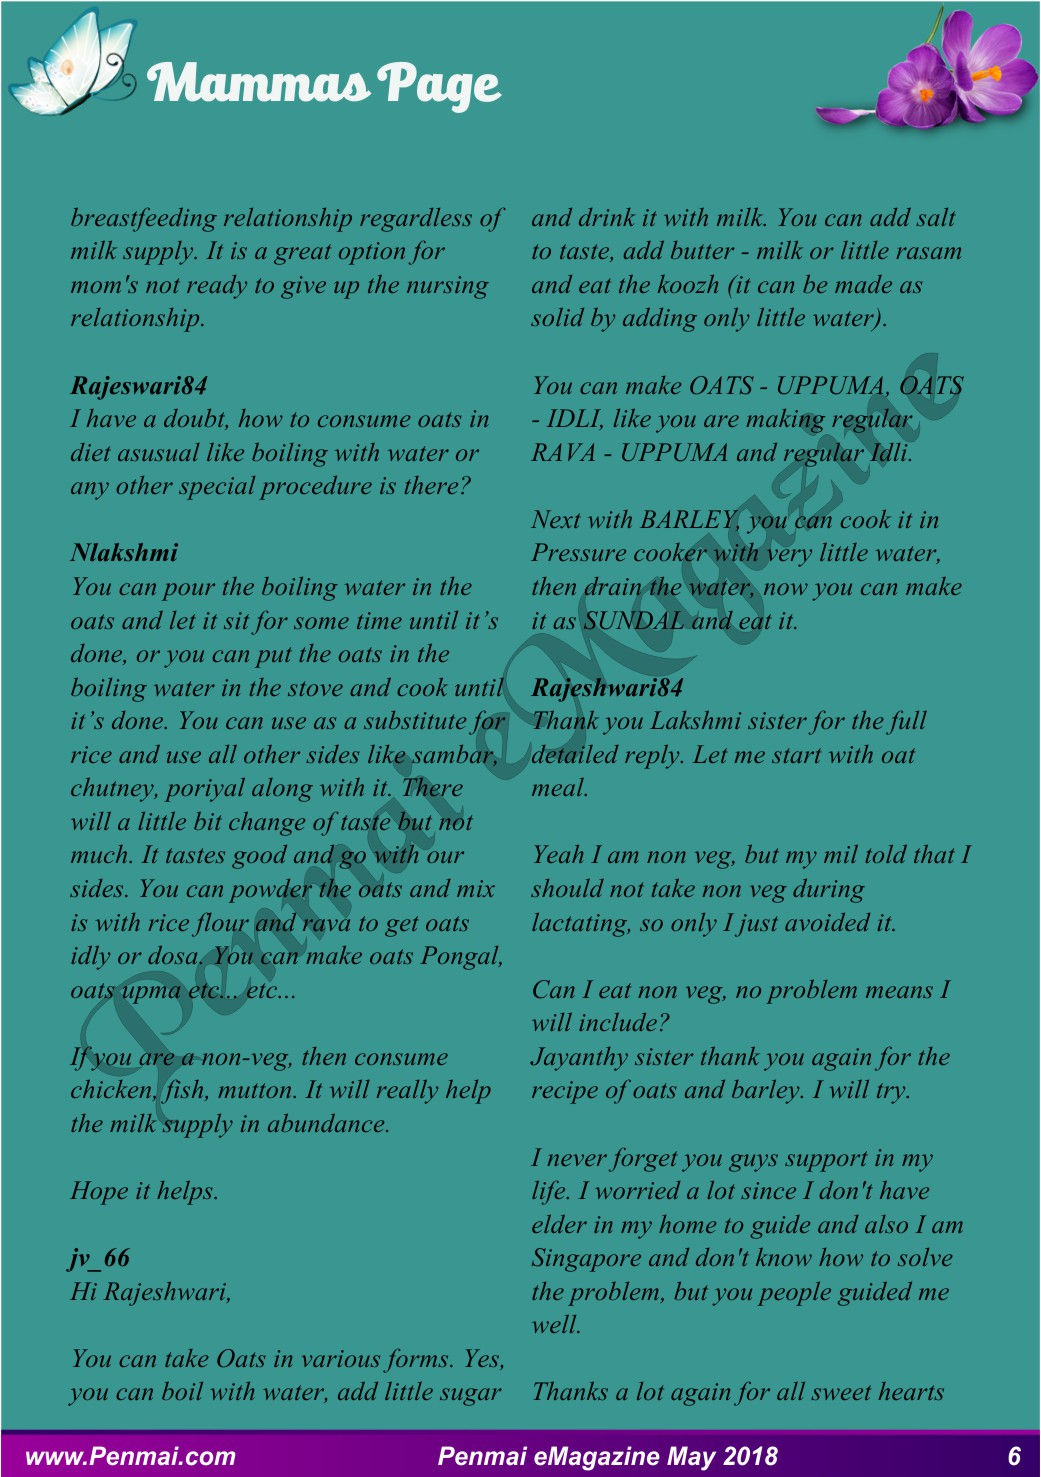 Penmai-eMagazine-May-2018-6.jpg